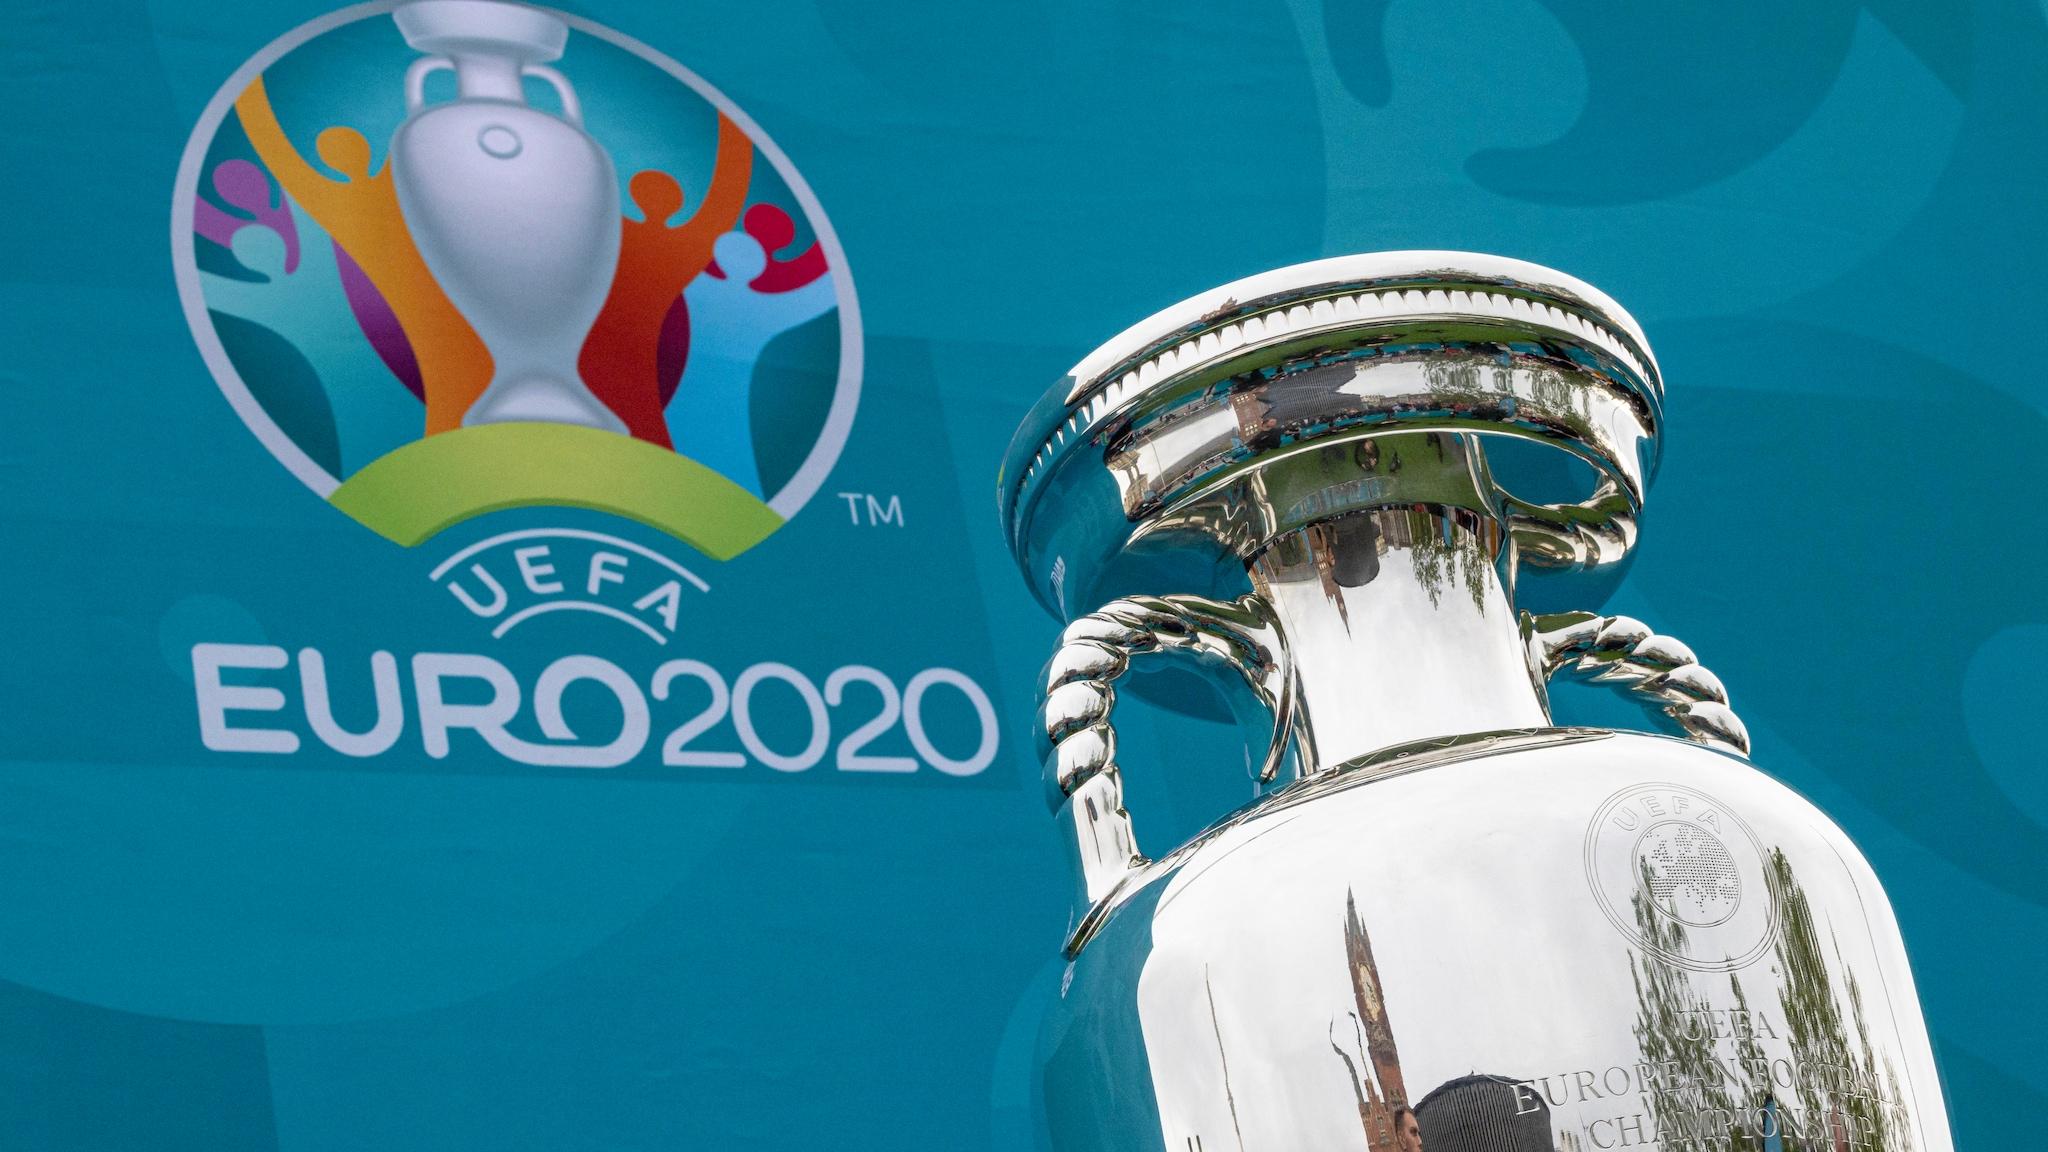 Calendario de partidos de la UEFA EURO 2020 | UEFA EURO 2020 | UEFA.com